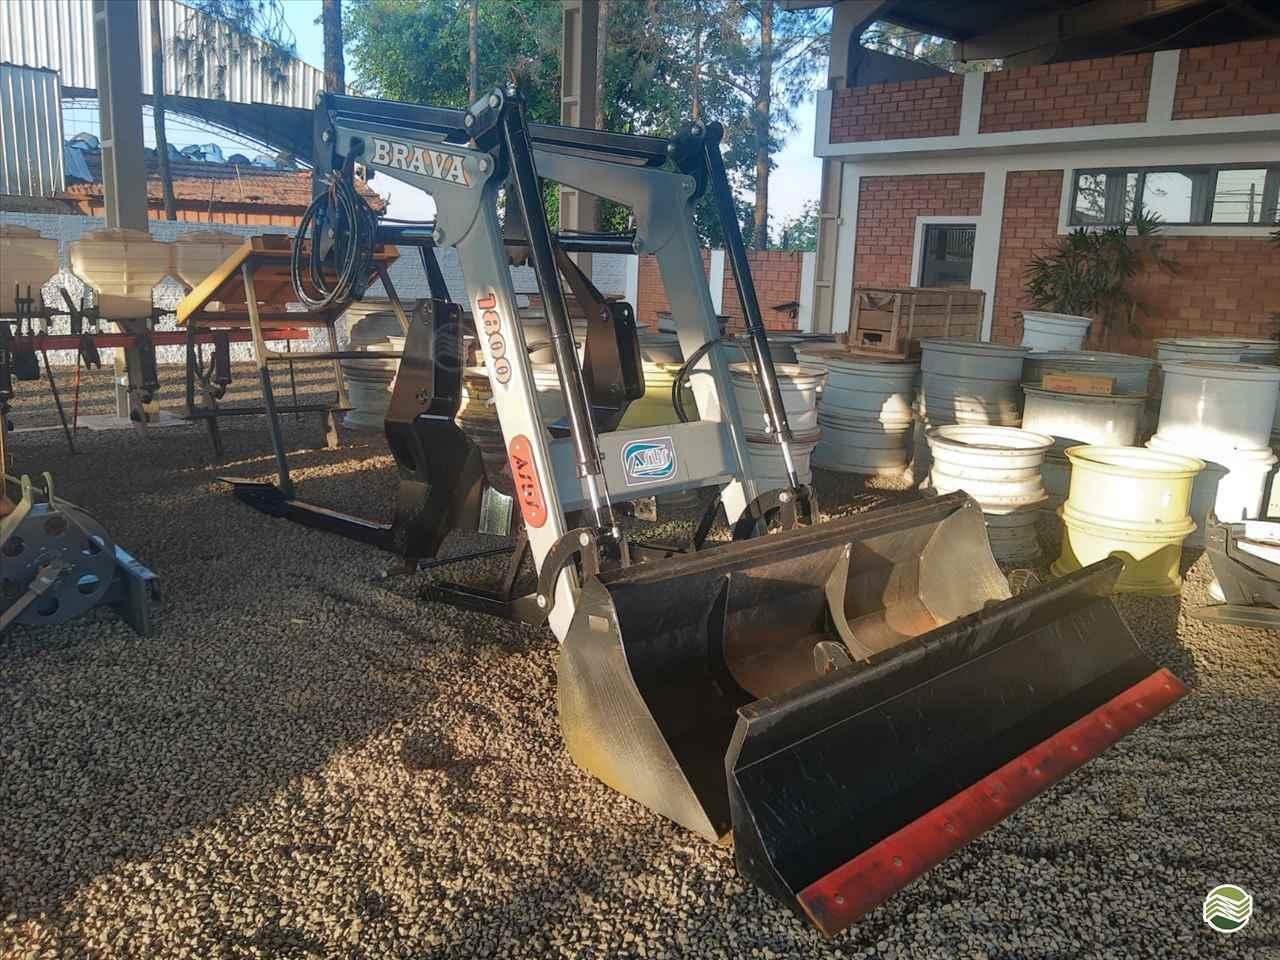 IMPLEMENTOS AGRICOLAS CONCHA E LAMINA LAMINA FRONTAL GR Máquinas Agrícolas ARAPONGAS PARANÁ PR